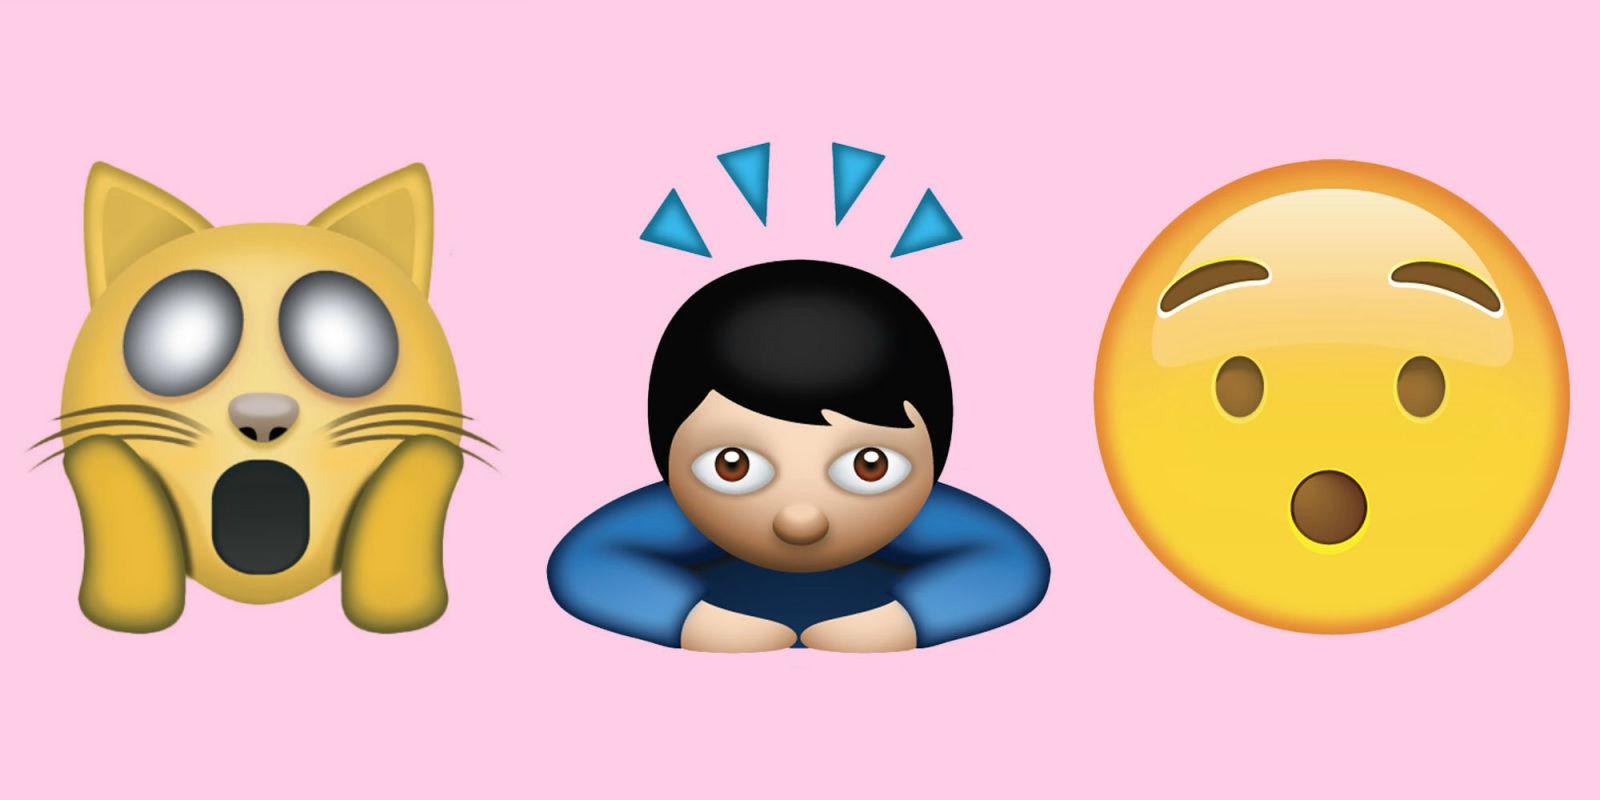 Alien face emoji meaning - Alien Face Emoji Meaning 20